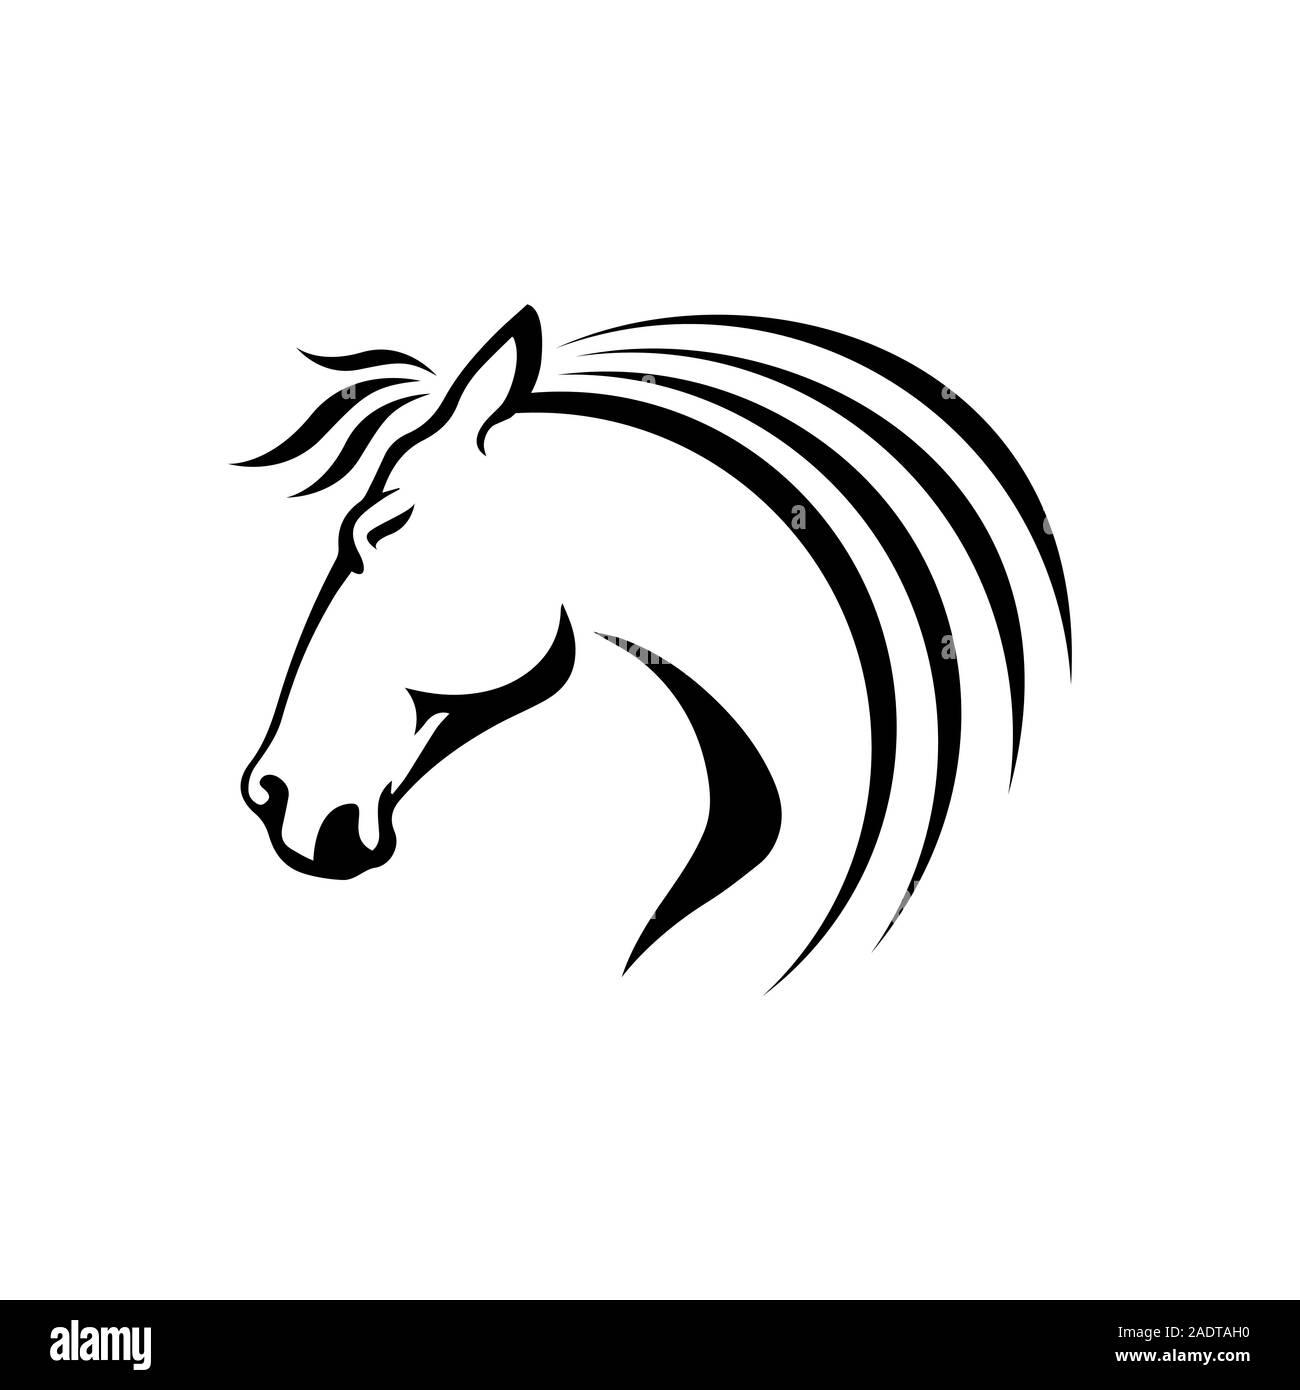 Black Stallion Horse Head Logo Vector Symbol The Silhoutte Of Black Horse Illustration Design Stock Vector Image Art Alamy